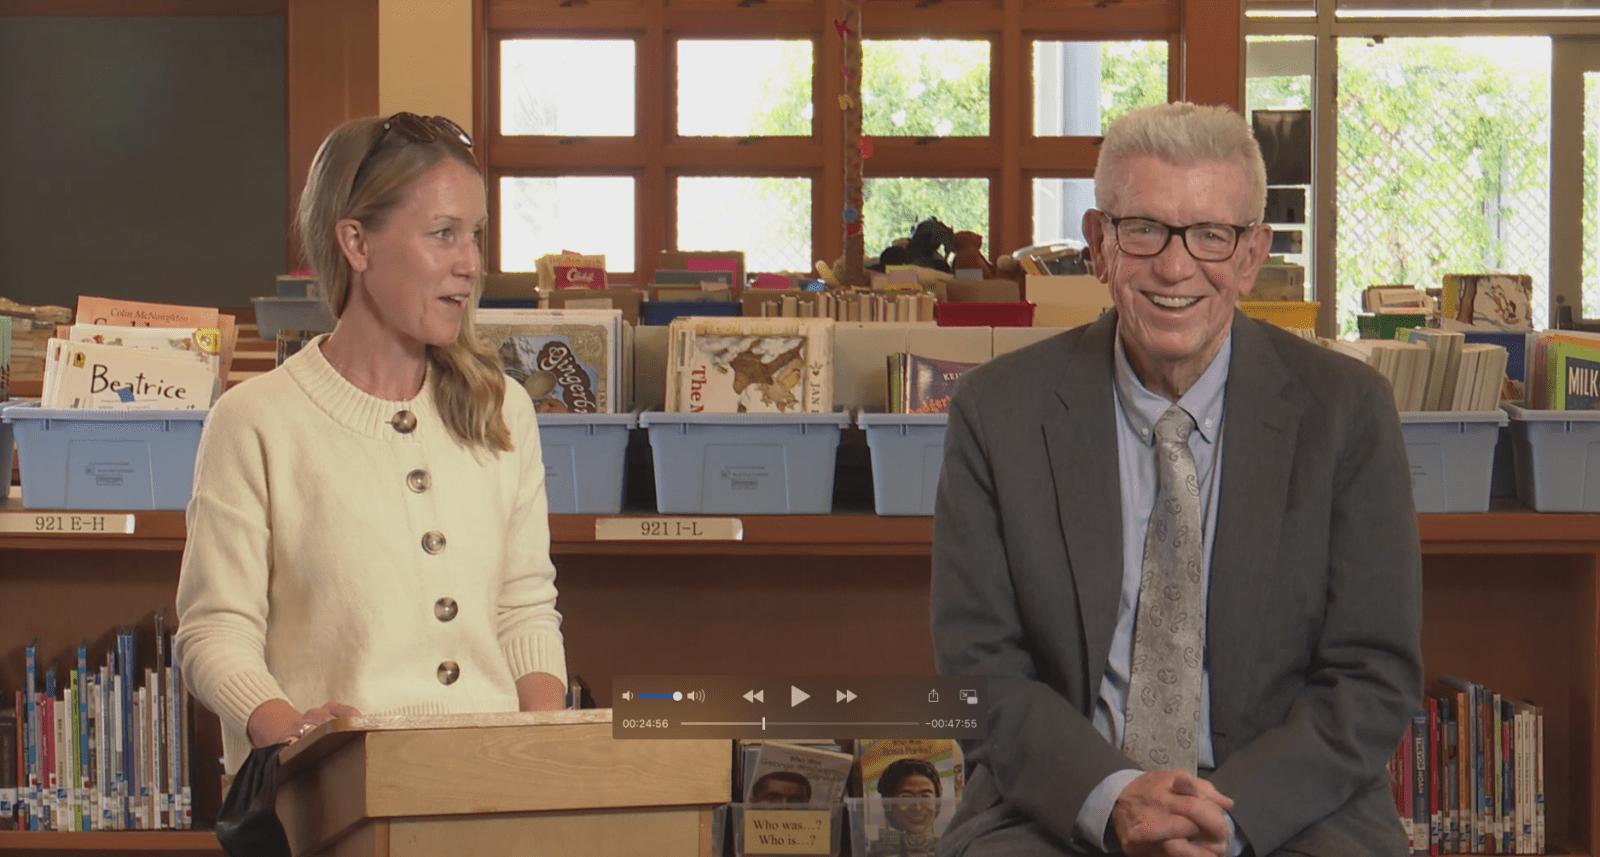 Santa Barbara Education Foundation Turns Hope into Reality by Raising $71,000